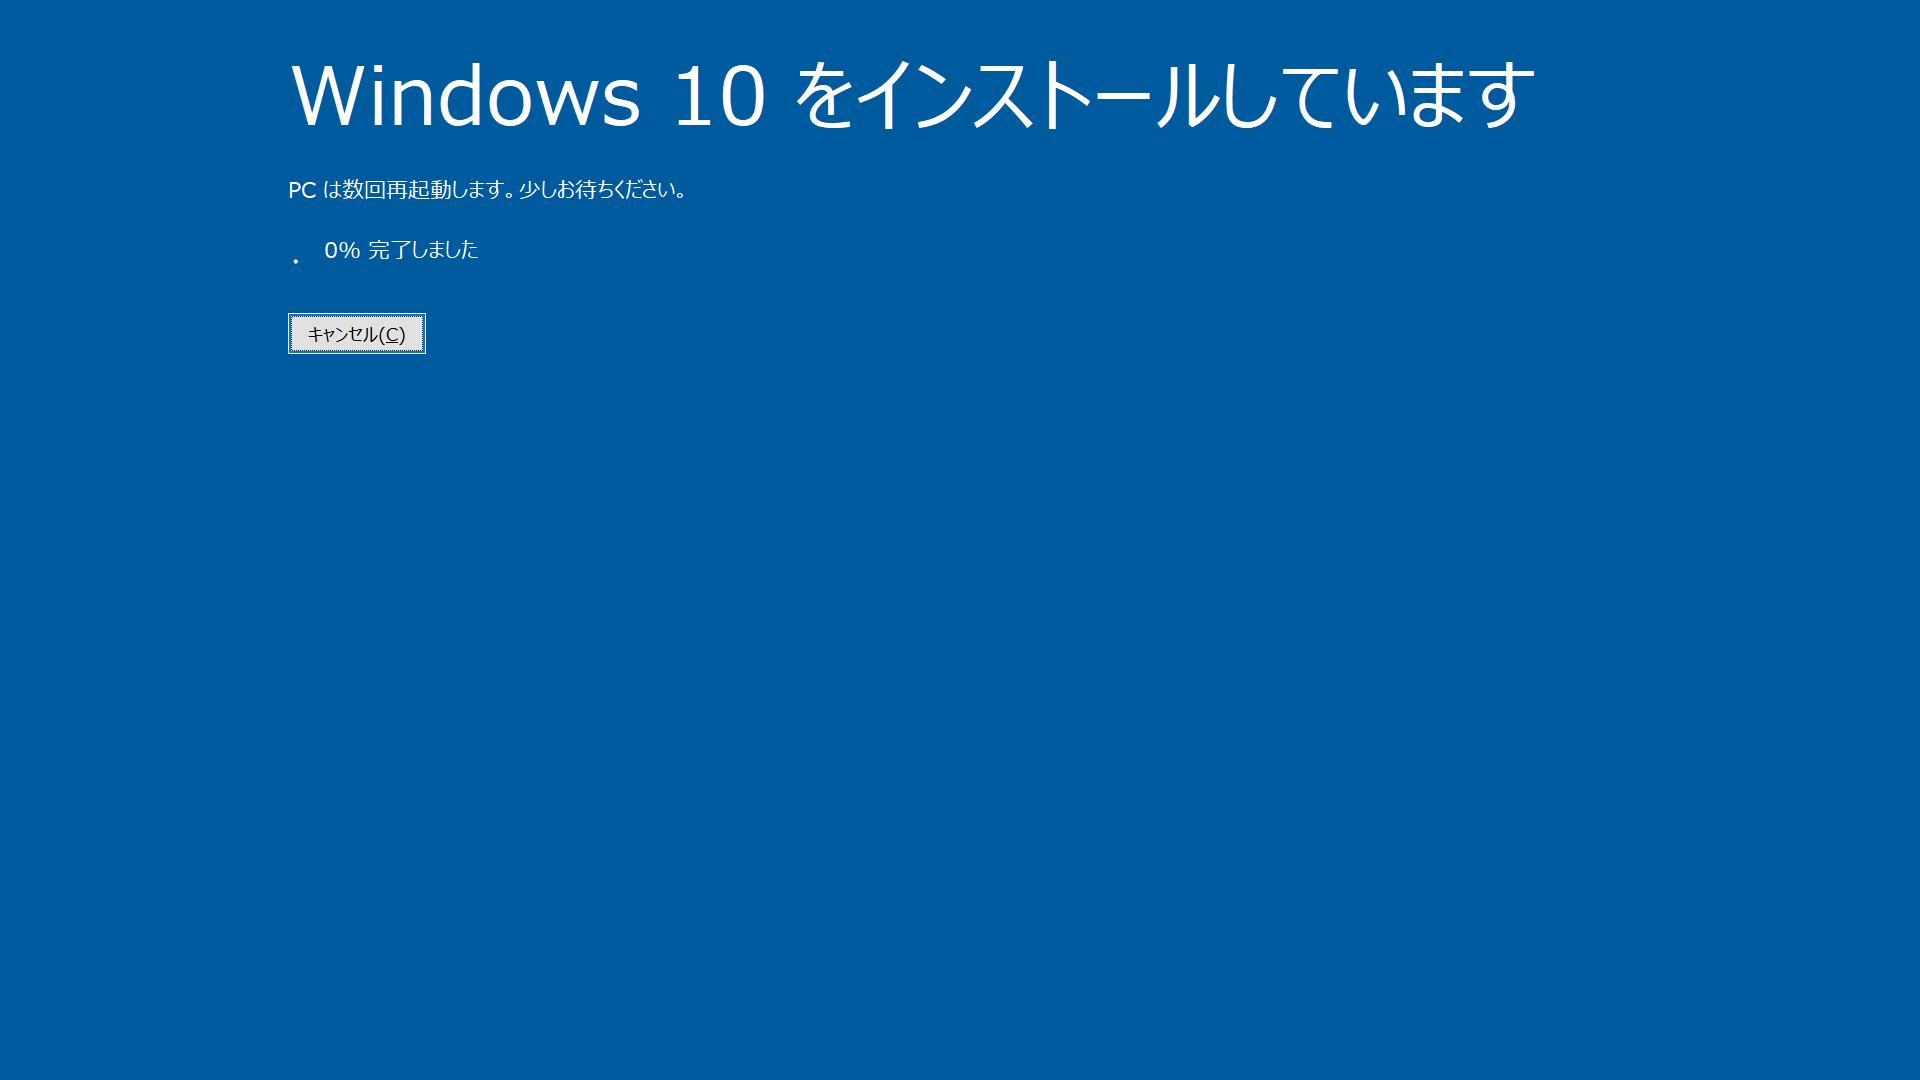 Windows10 1903 から 2004、ISOでアップデート_a0056607_16522752.png